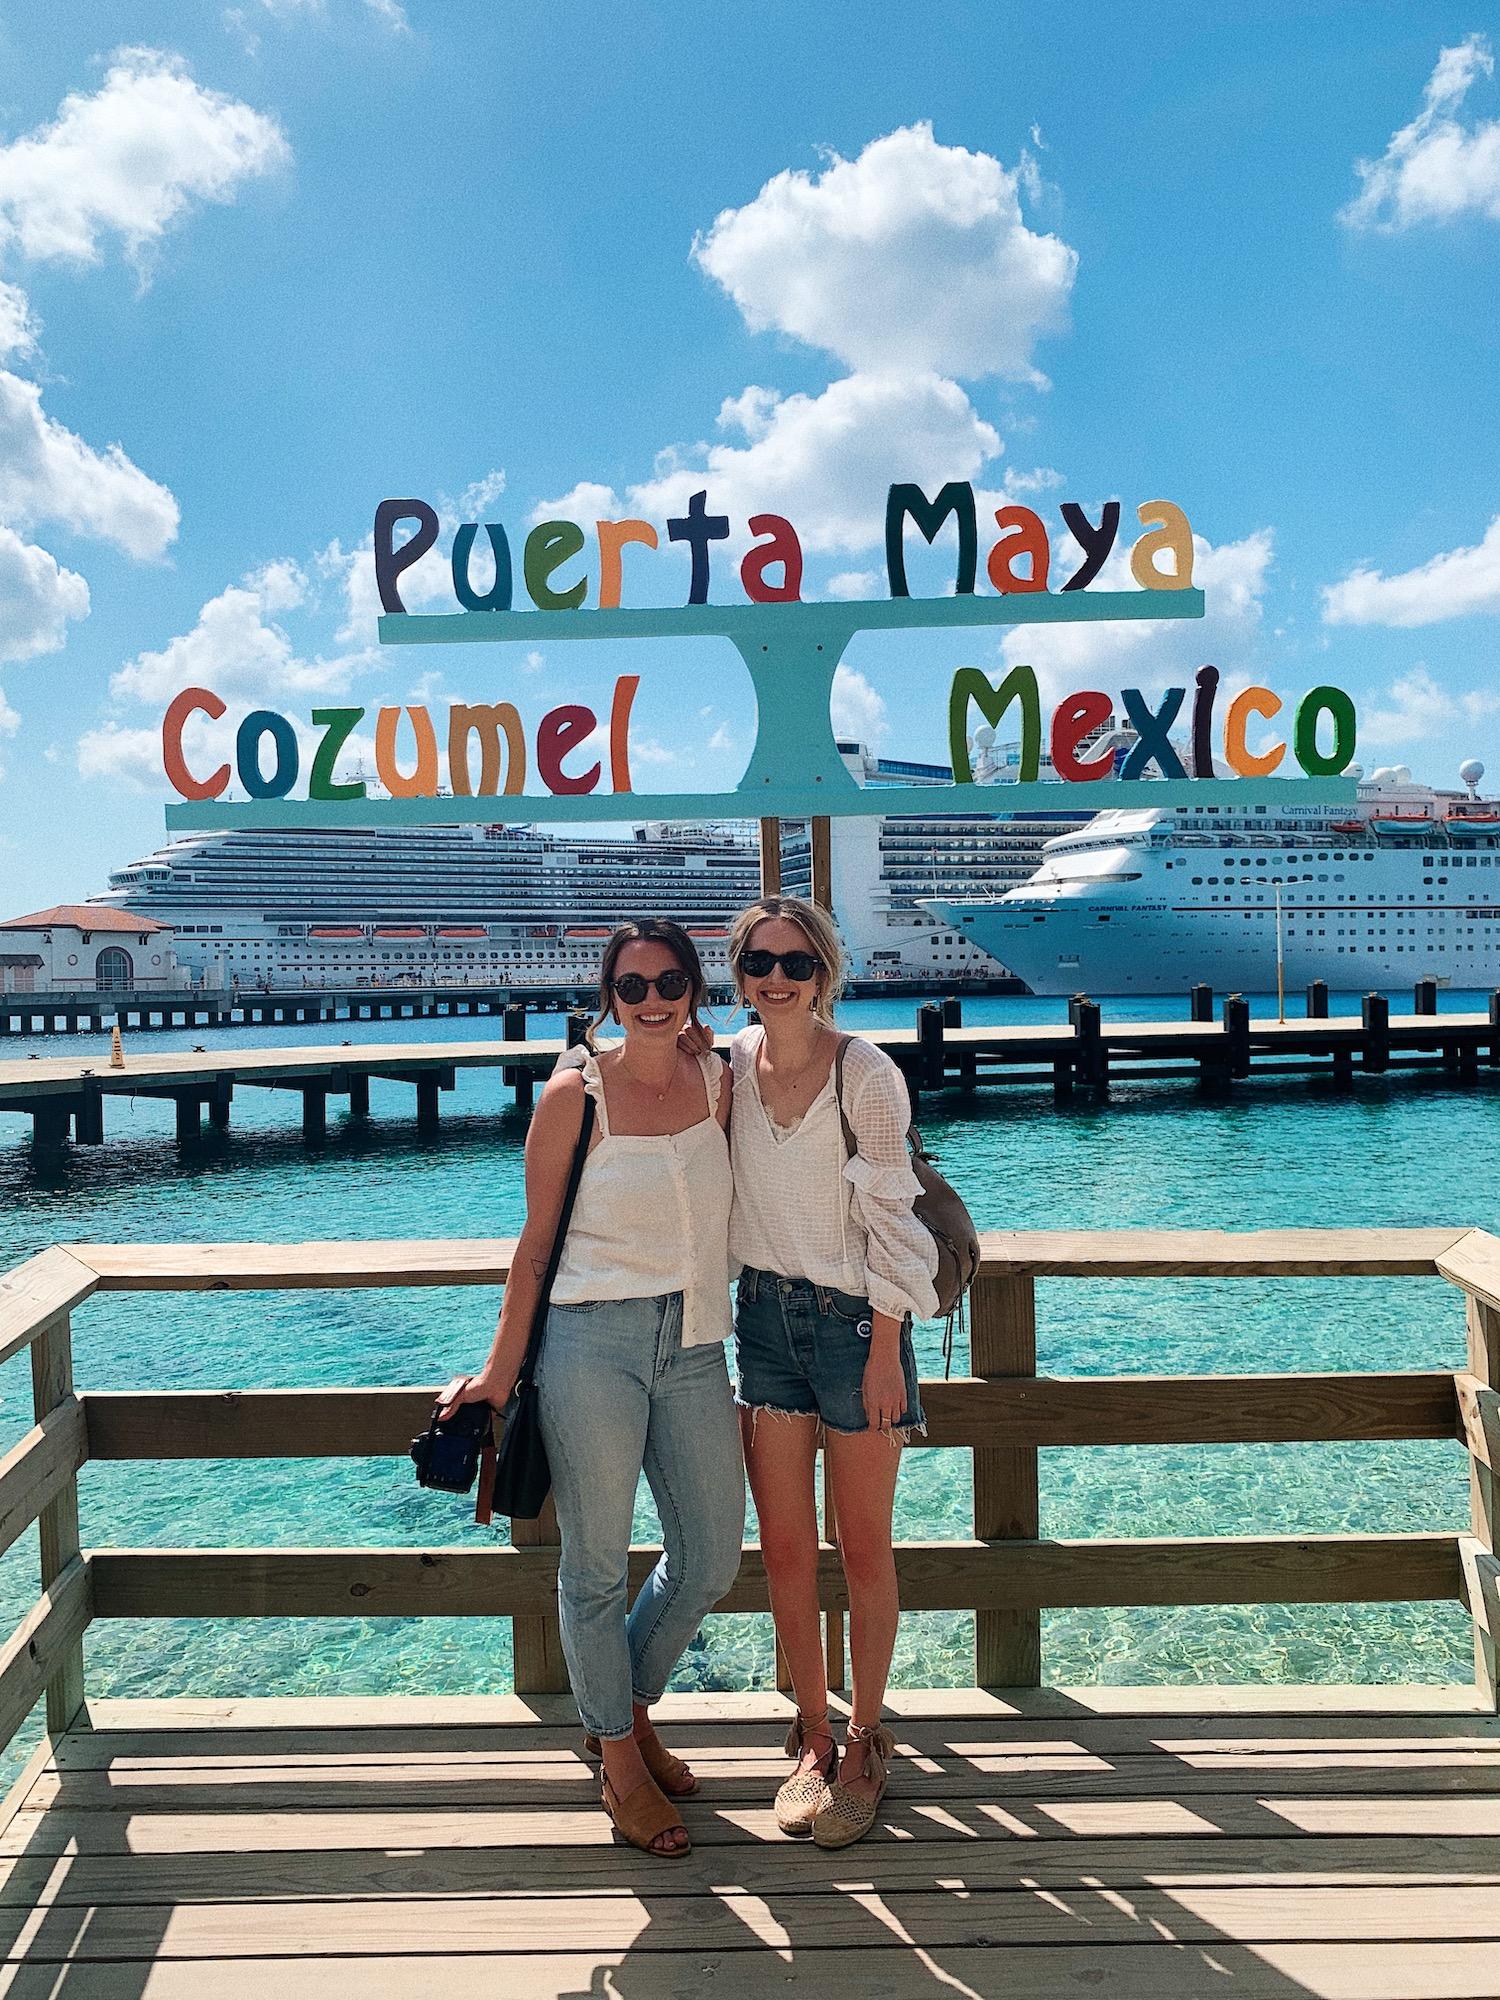 Caribbean Princess, 7 Day Western Caribbean Cruise, Princess Cruises, Puerta Maya, travel blogger, cruise ship, cruising, spring break trip